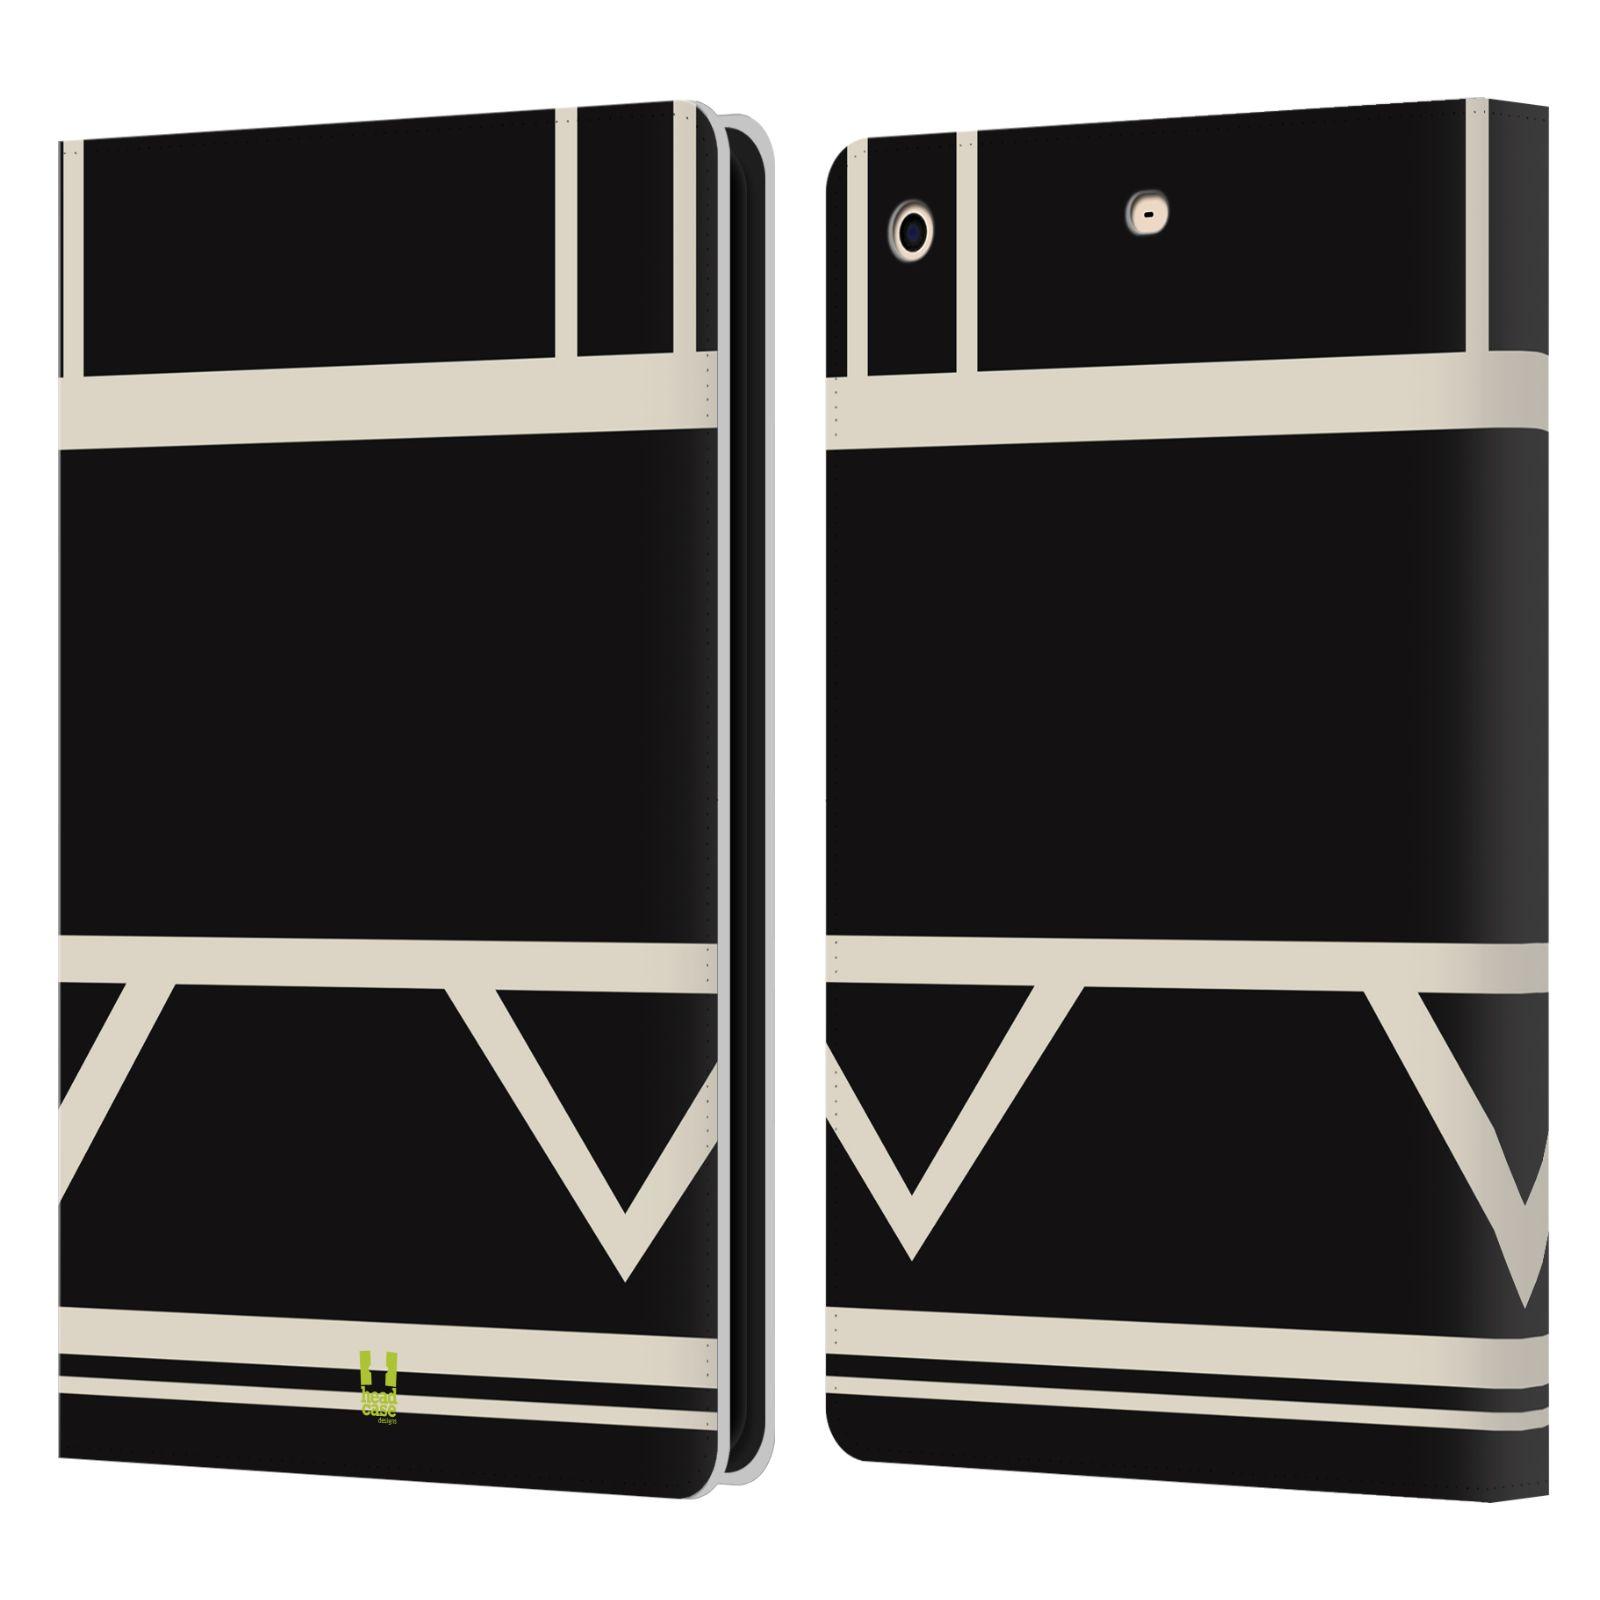 HEAD CASE Flipové pouzdro pro tablet Apple iPad mini barevné tvary černá a bílá proužek